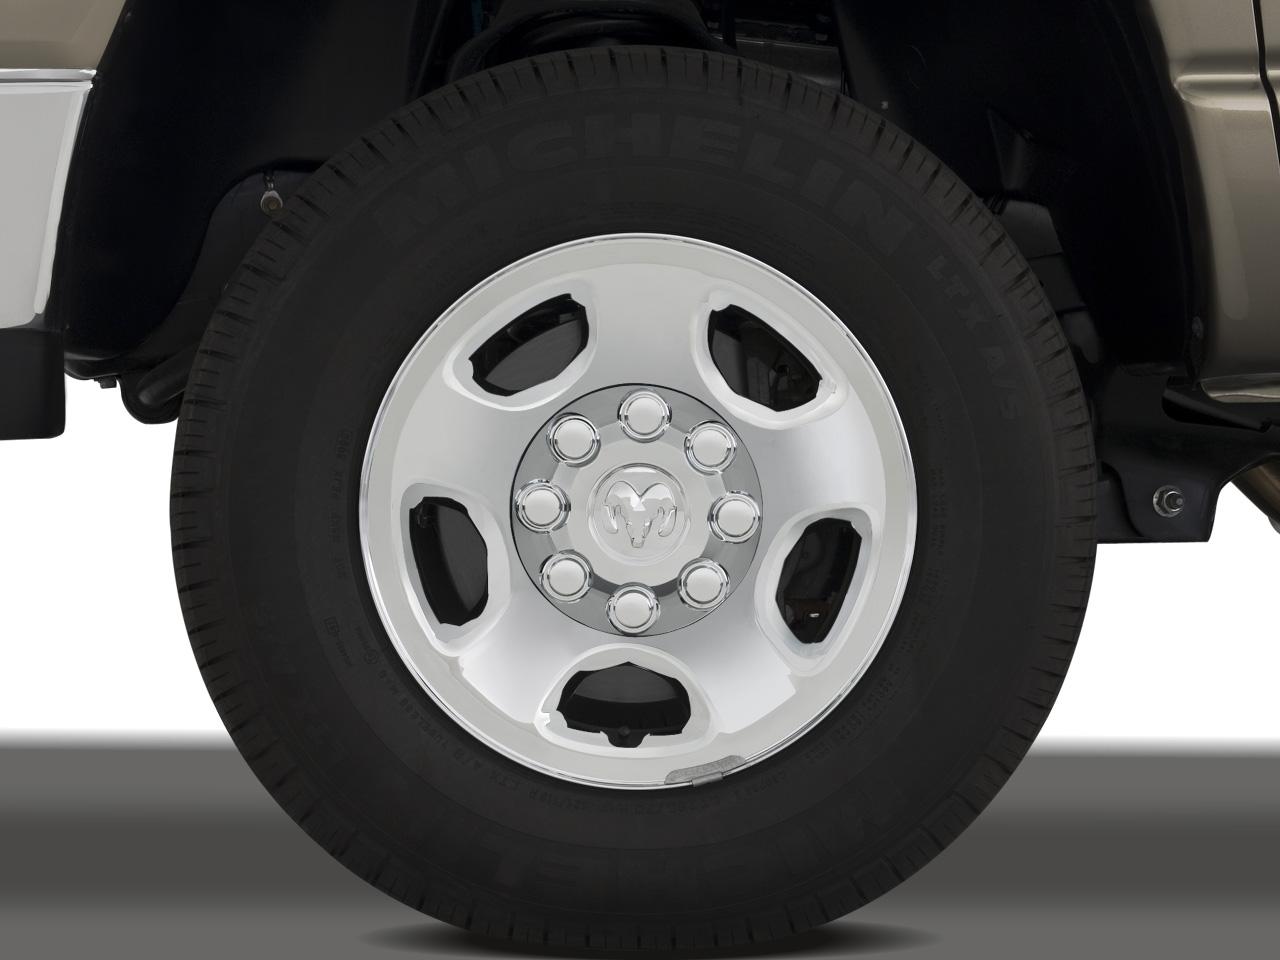 Dodge Ram Slt Mega Cab Wd Truck Wheel Cap on 97 Dodge Ram Sport